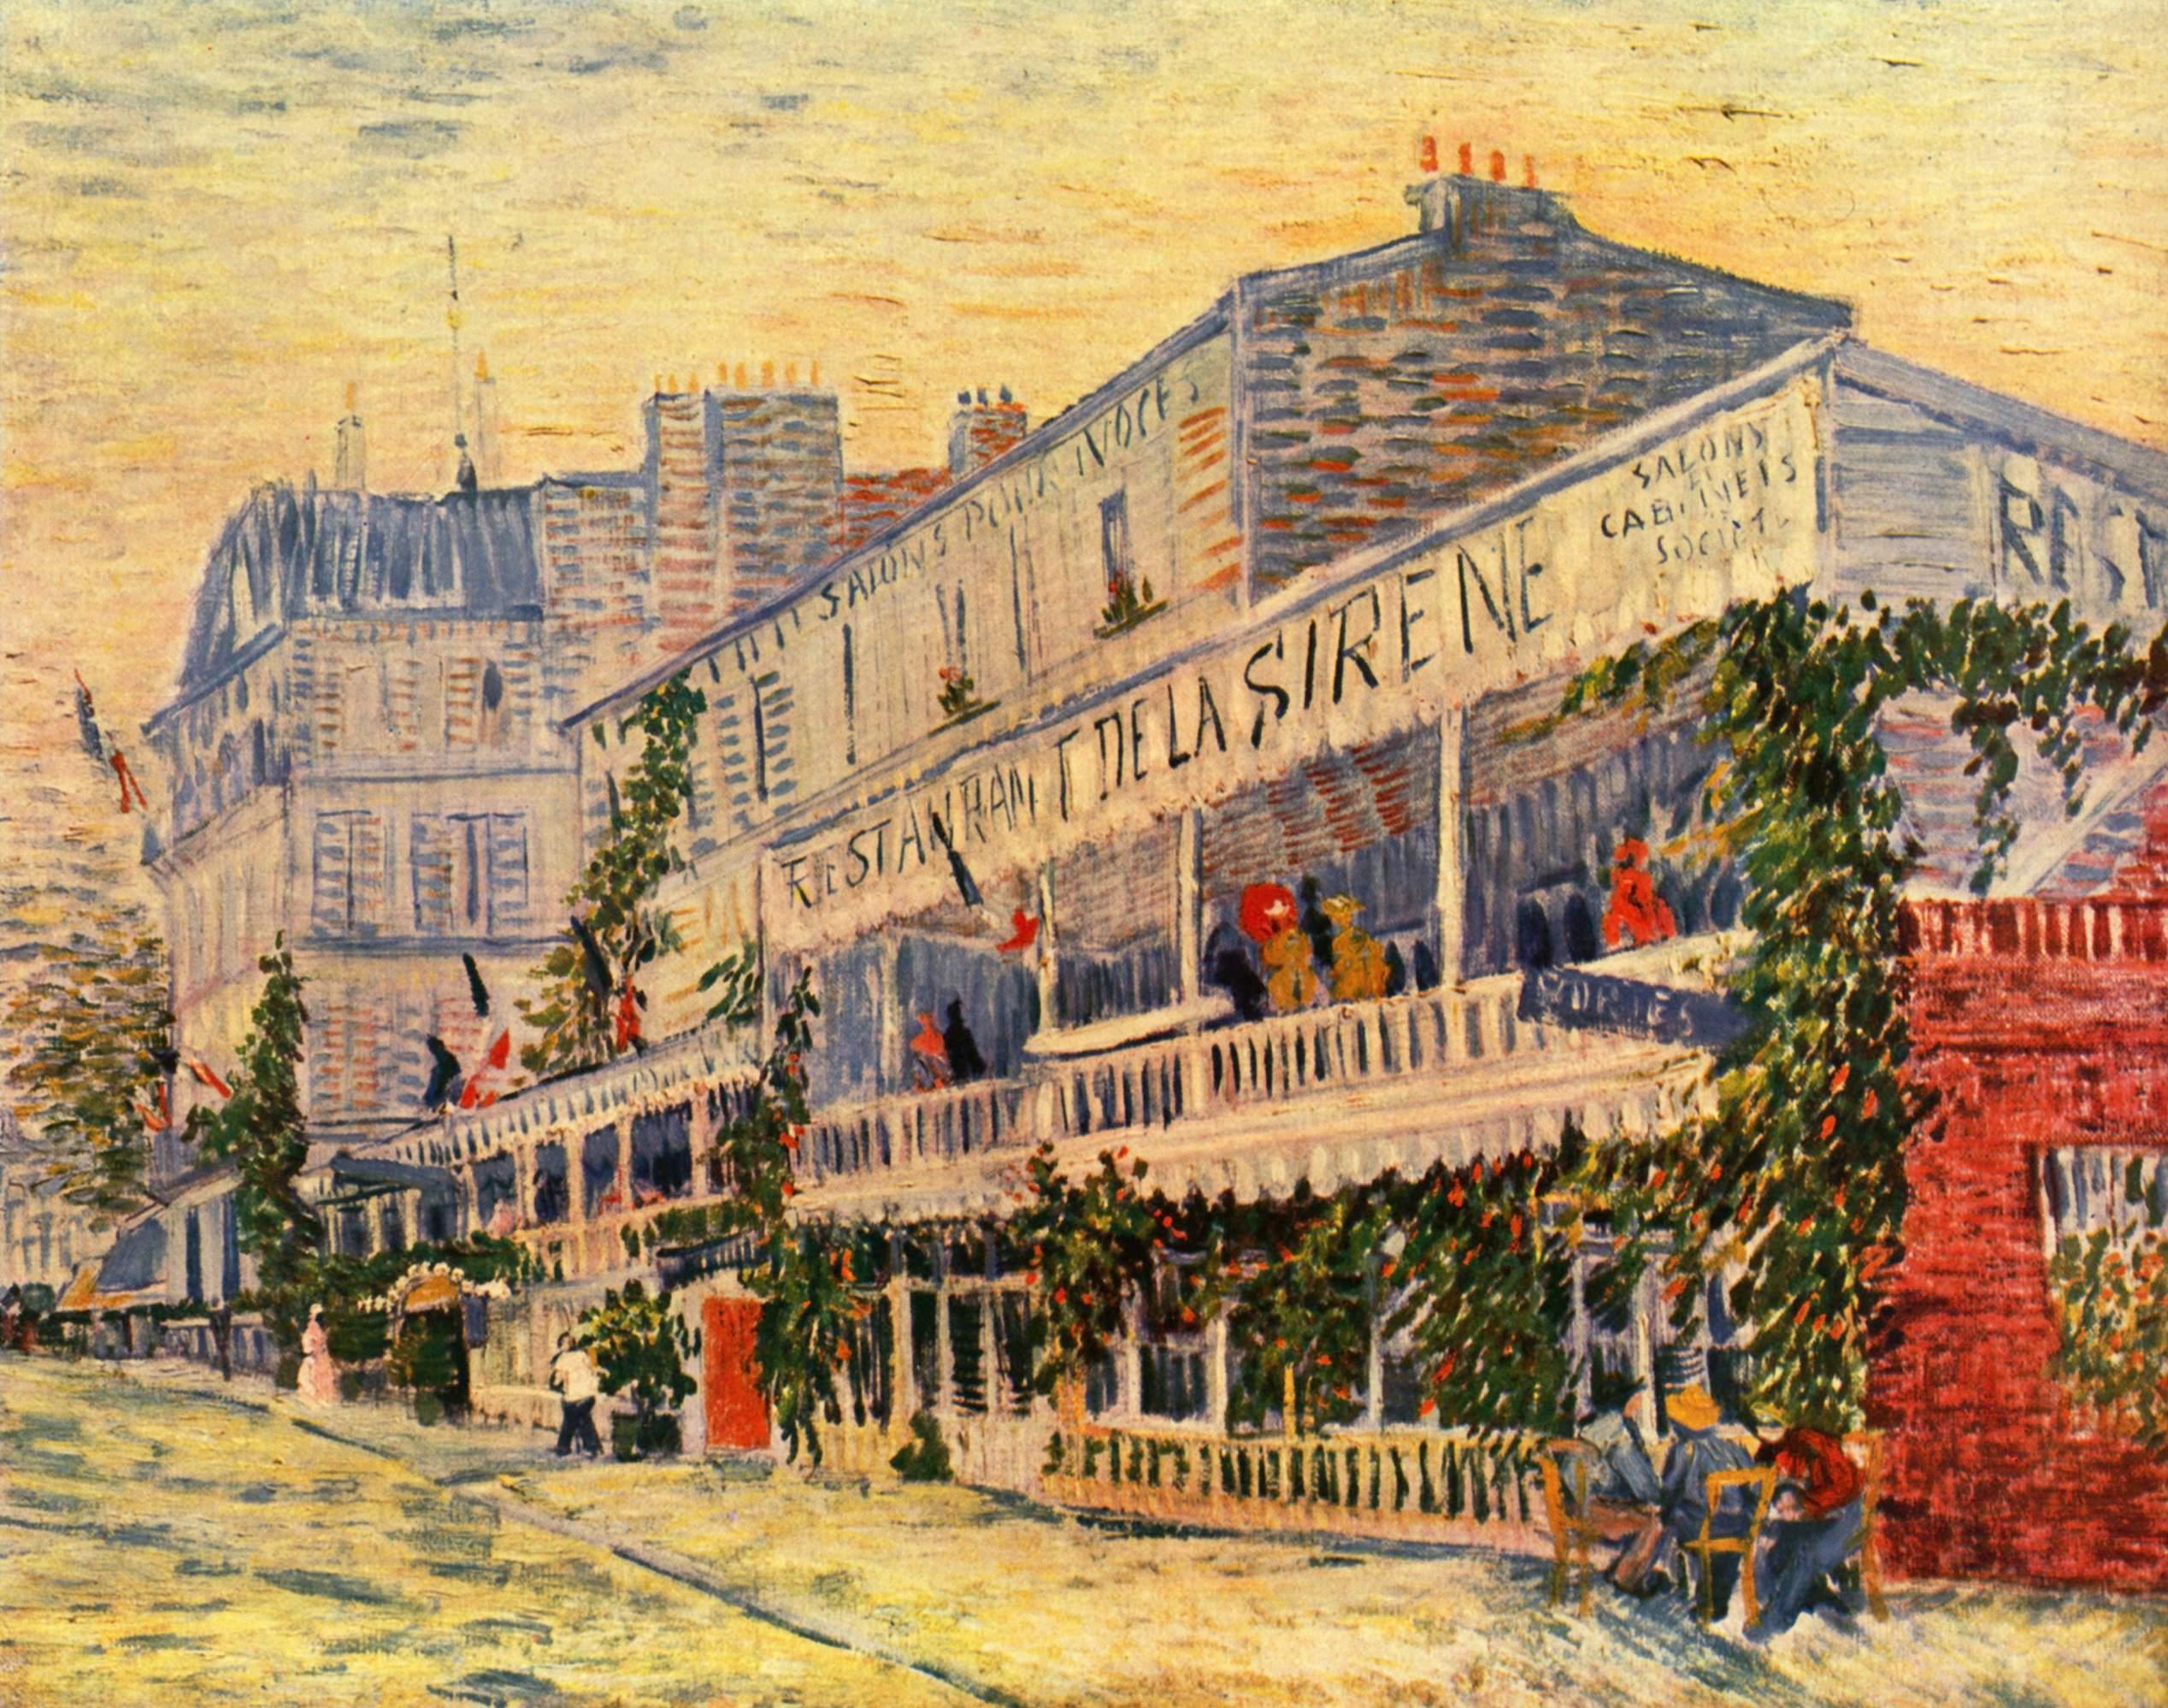 Restaurant de la Sirene. Vincent Van Gogh